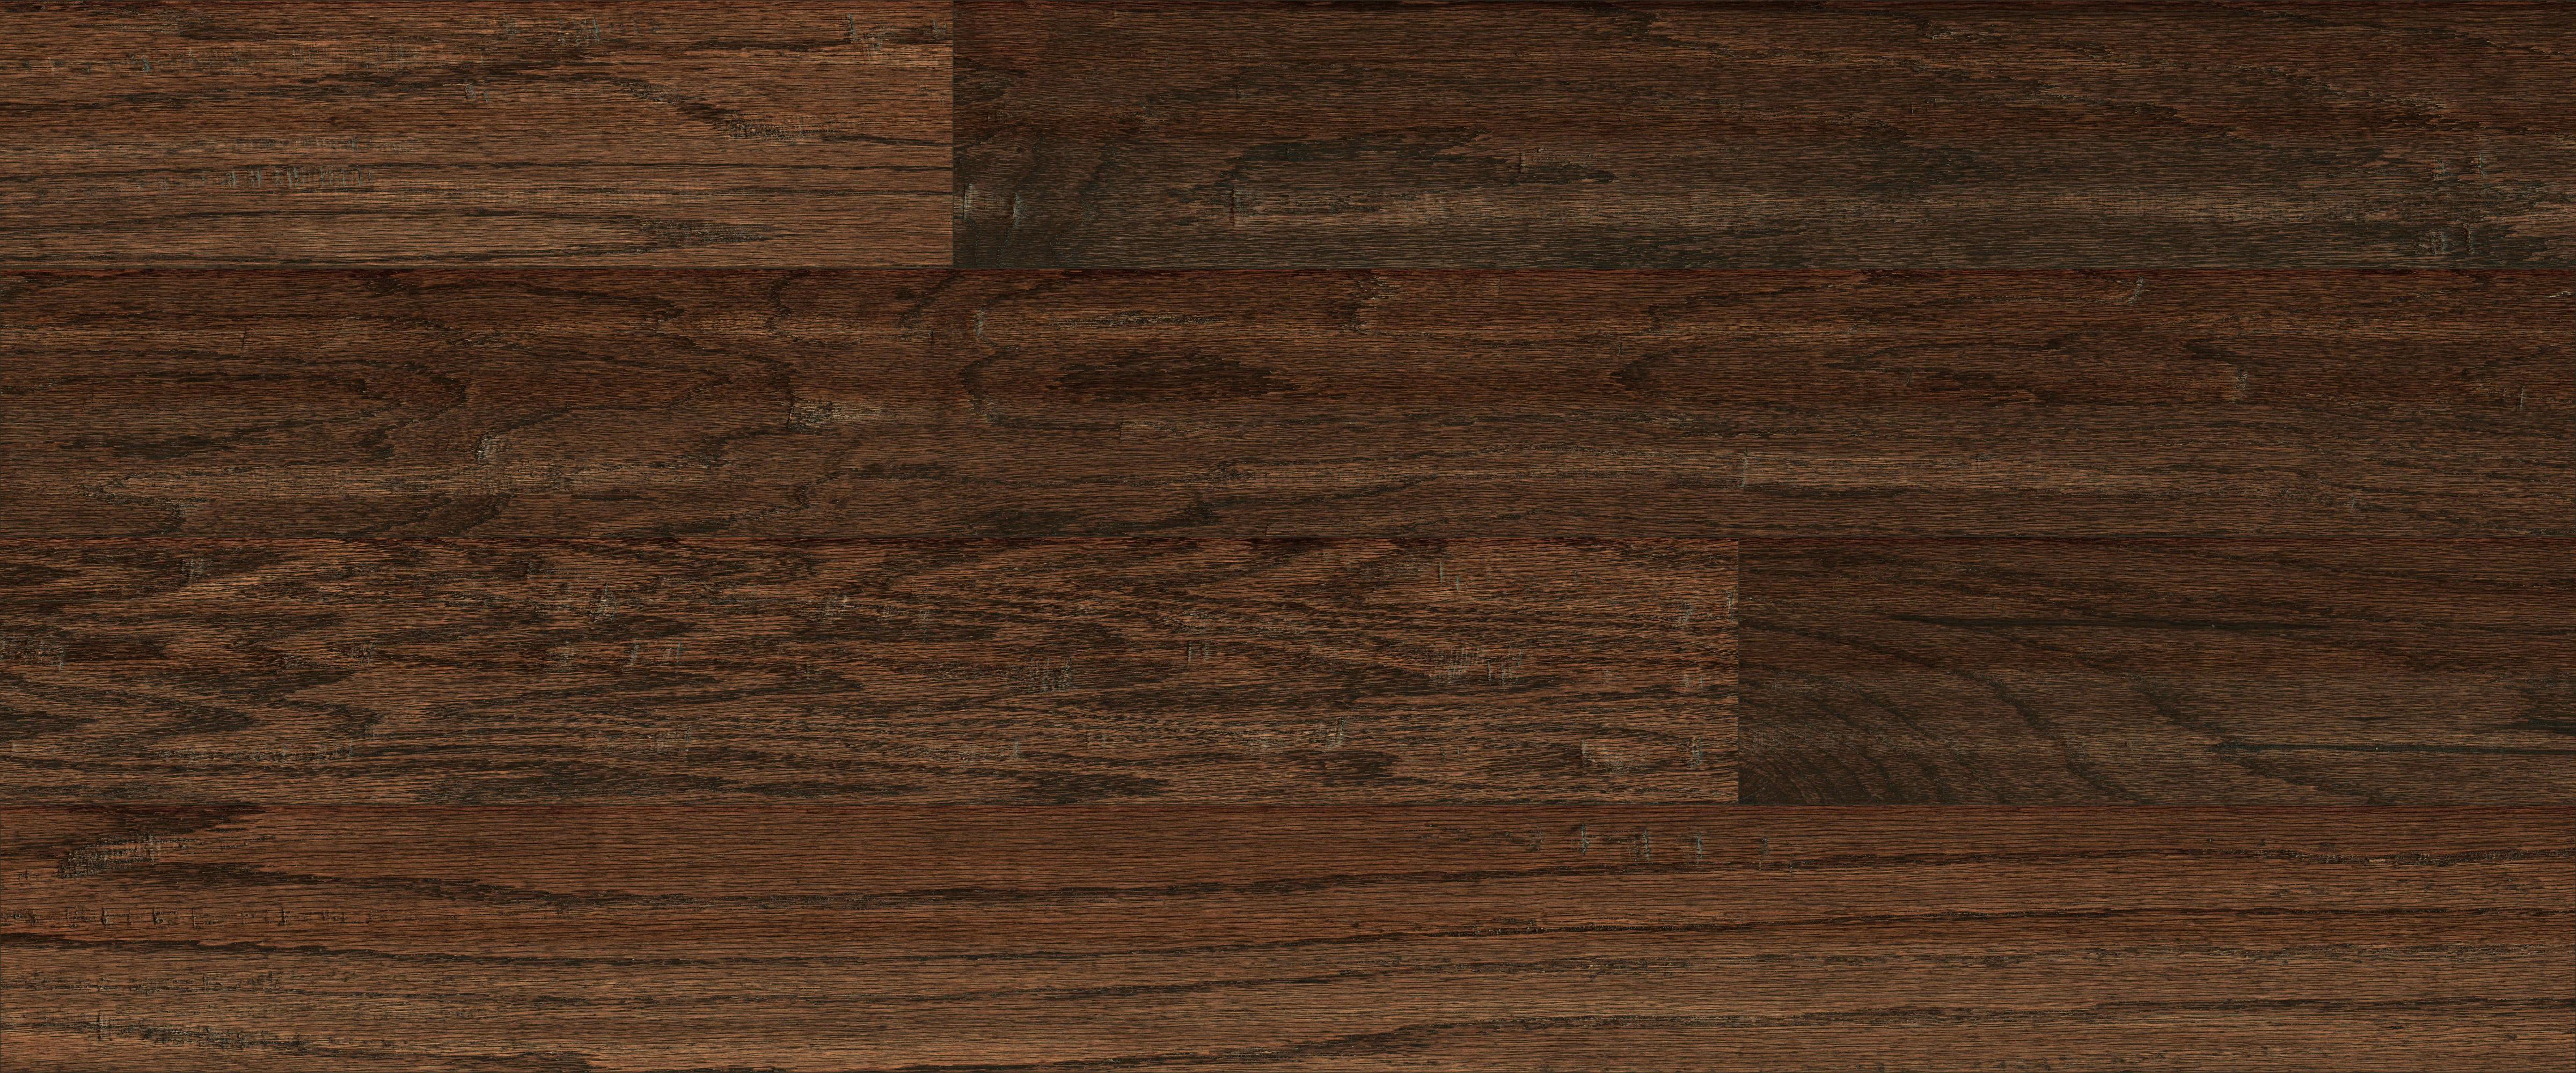 11 Best Engineered Hardwood Flooring Price Per Square Foot 2021 free download engineered hardwood flooring price per square foot of mullican lincolnshire sculpted red oak laredo 5 engineered hardwood in mullican lincolnshire sculpted red oak laredo 5 engineered hardwo